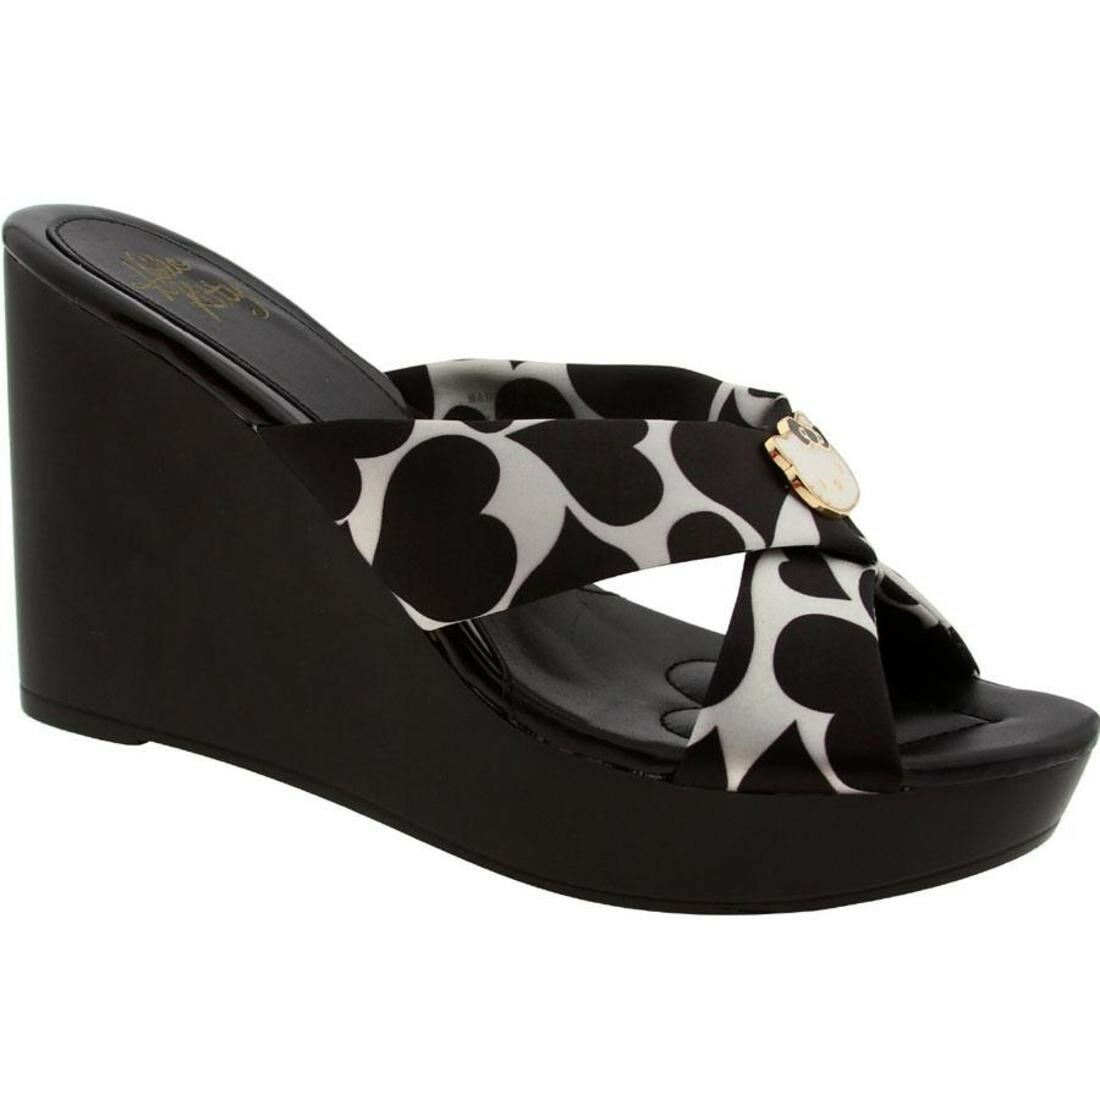 .99 Hello Kitty Damenschuhe Felice Heels Schuhes (schwarz print) MW1D03-BPT